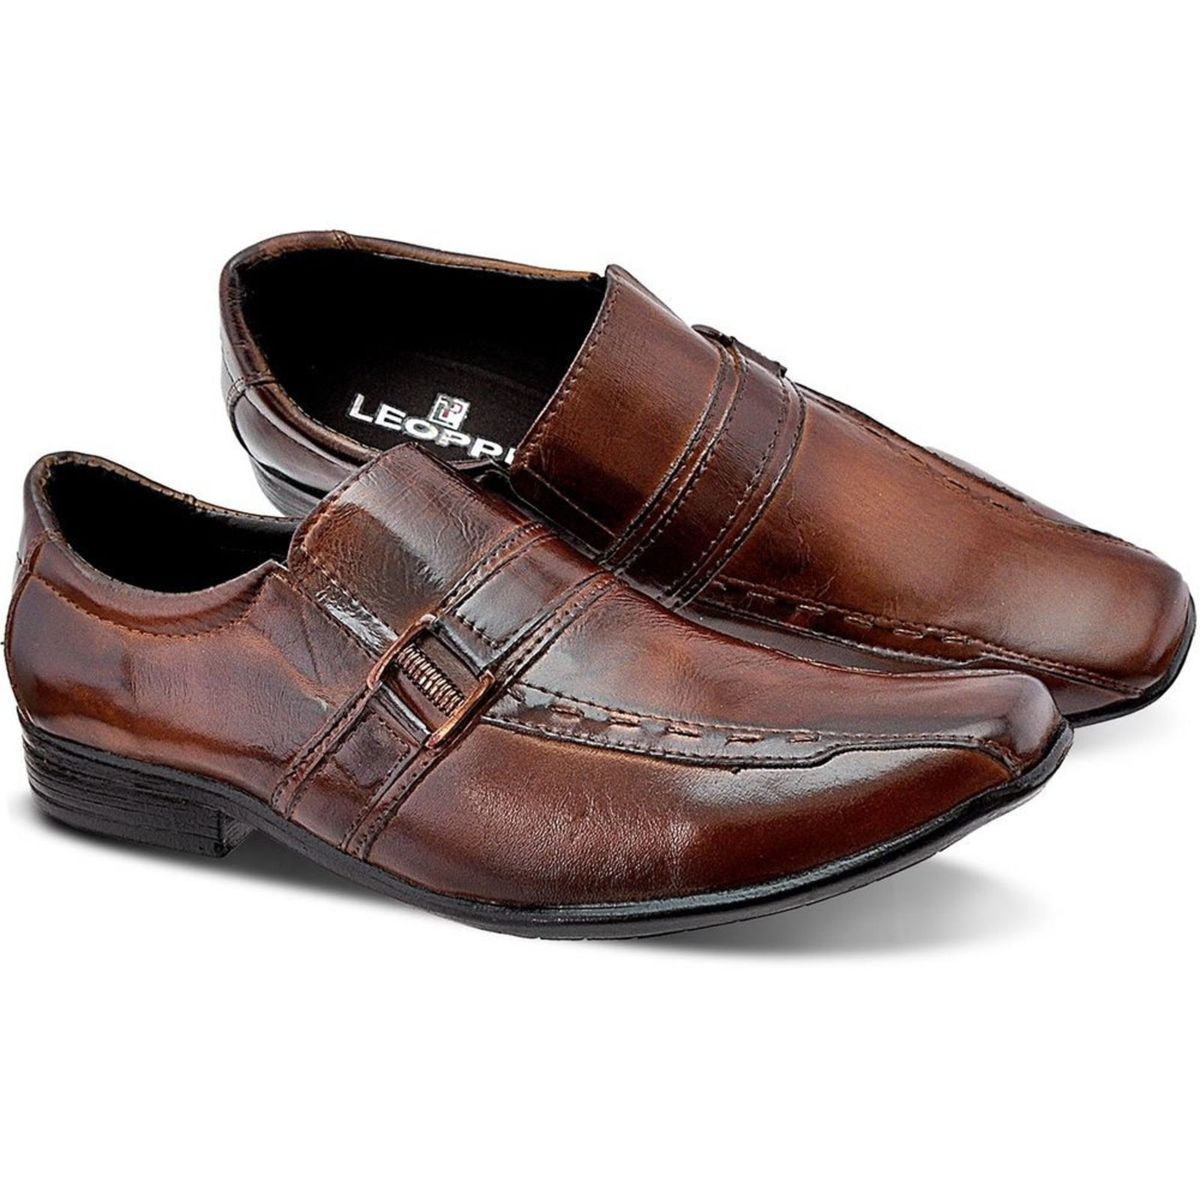 98fcdb449 Sapato Social Masculino Couro Legítimo Tam. 39 | Sapato Masculino Leoppé  Nunca Usado 24965847 | enjoei